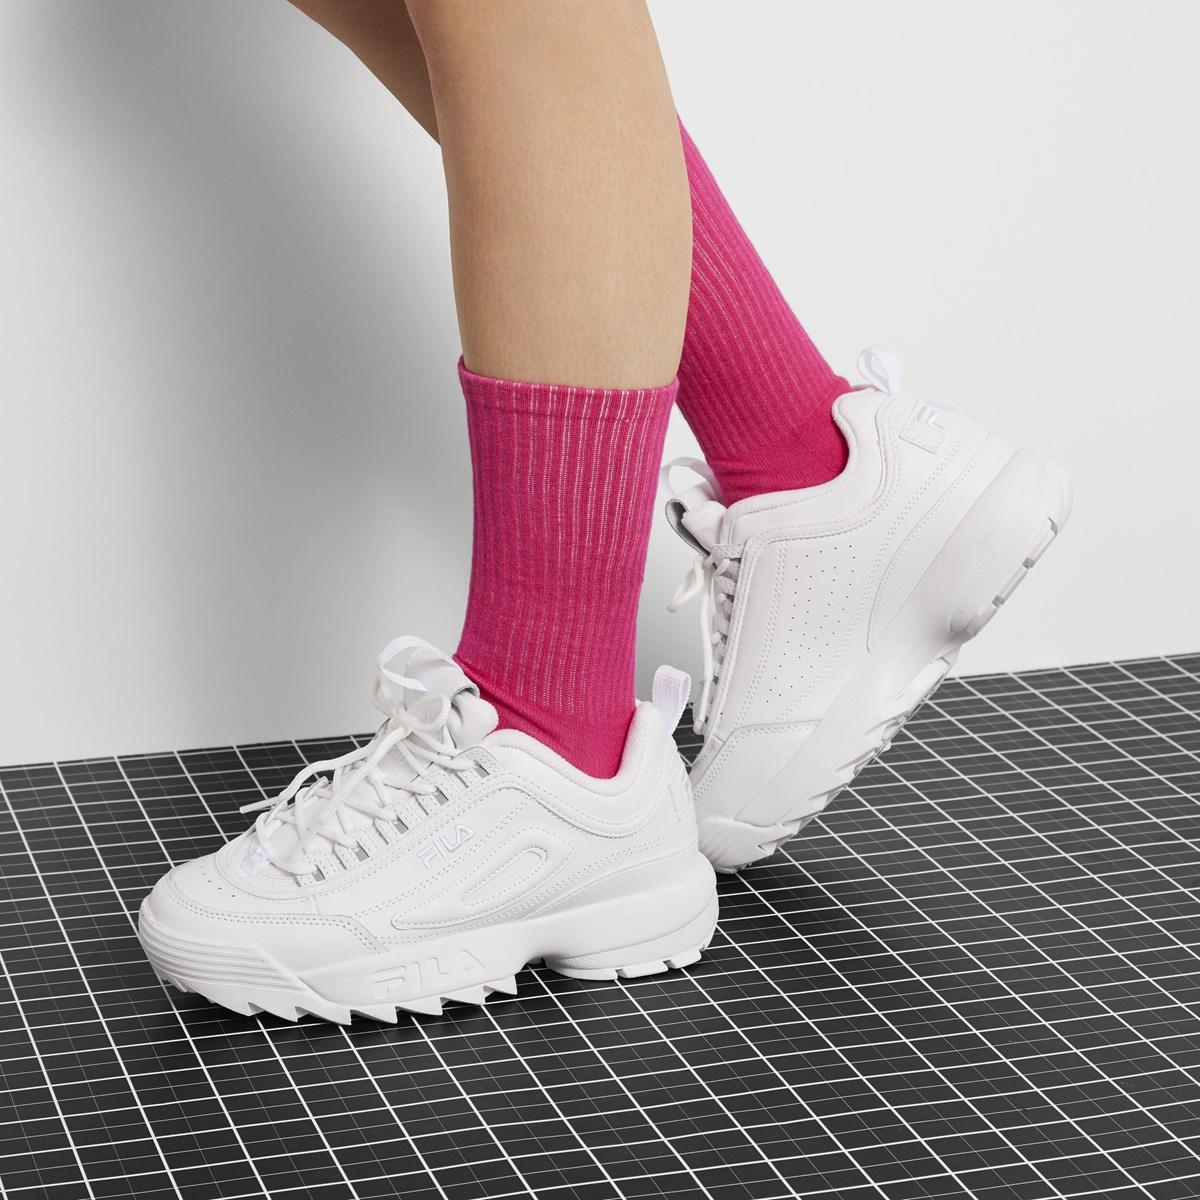 2019 New Fila_ Shoes Fila_ Disruptor Ii 2 Women Basketball Shoes Official White By Bjstgalt.